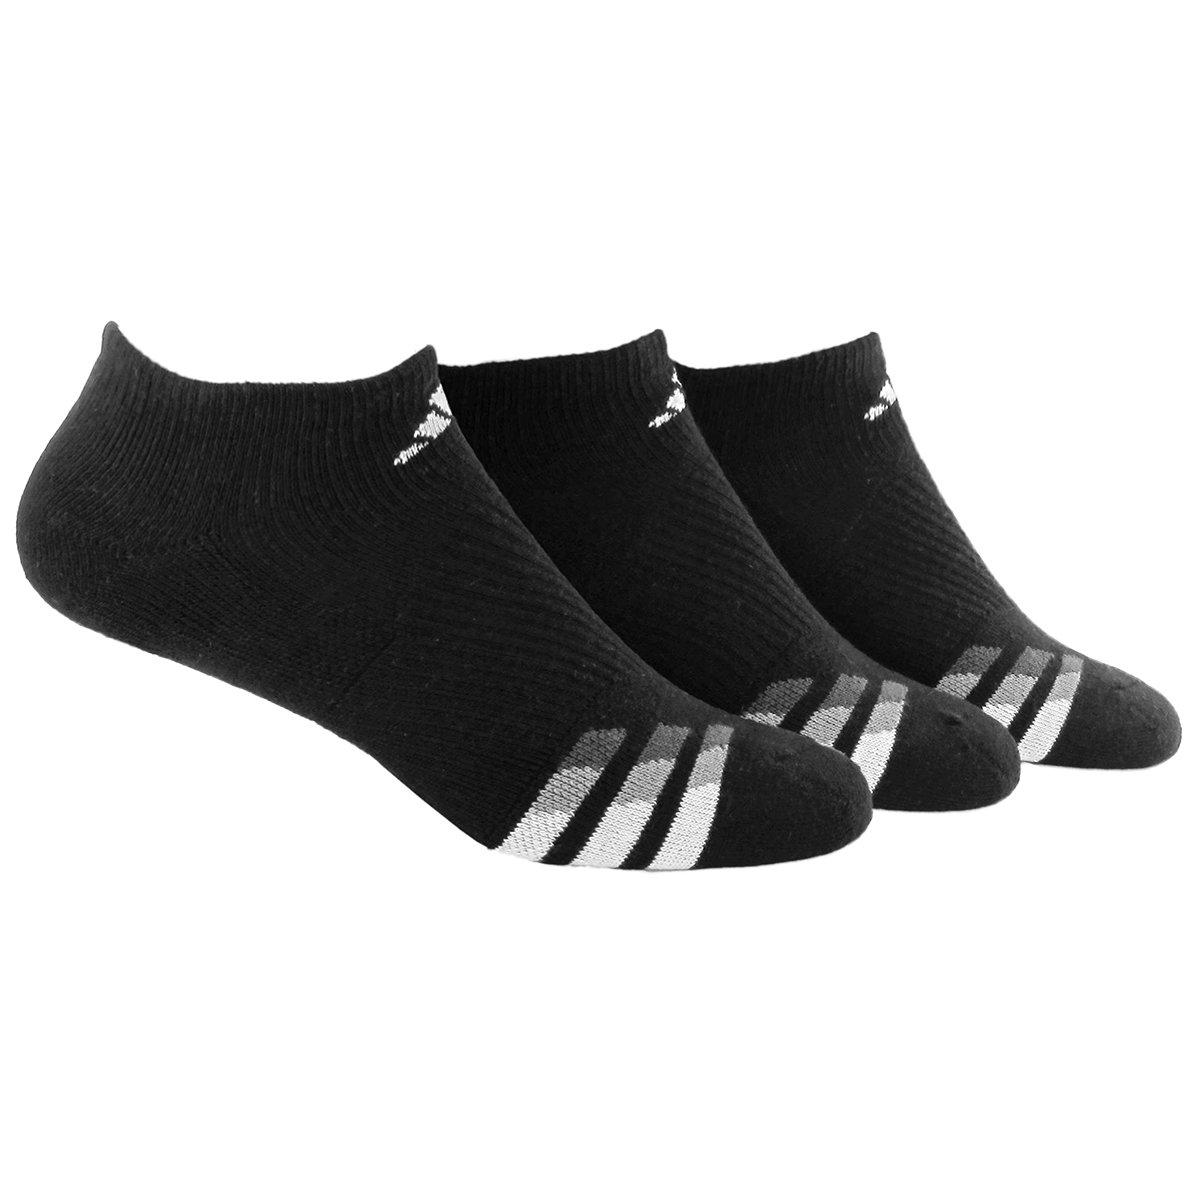 adidas Men's Cushioned 3-Pack No Show Socks, Black/White/Light Onix,X-Large